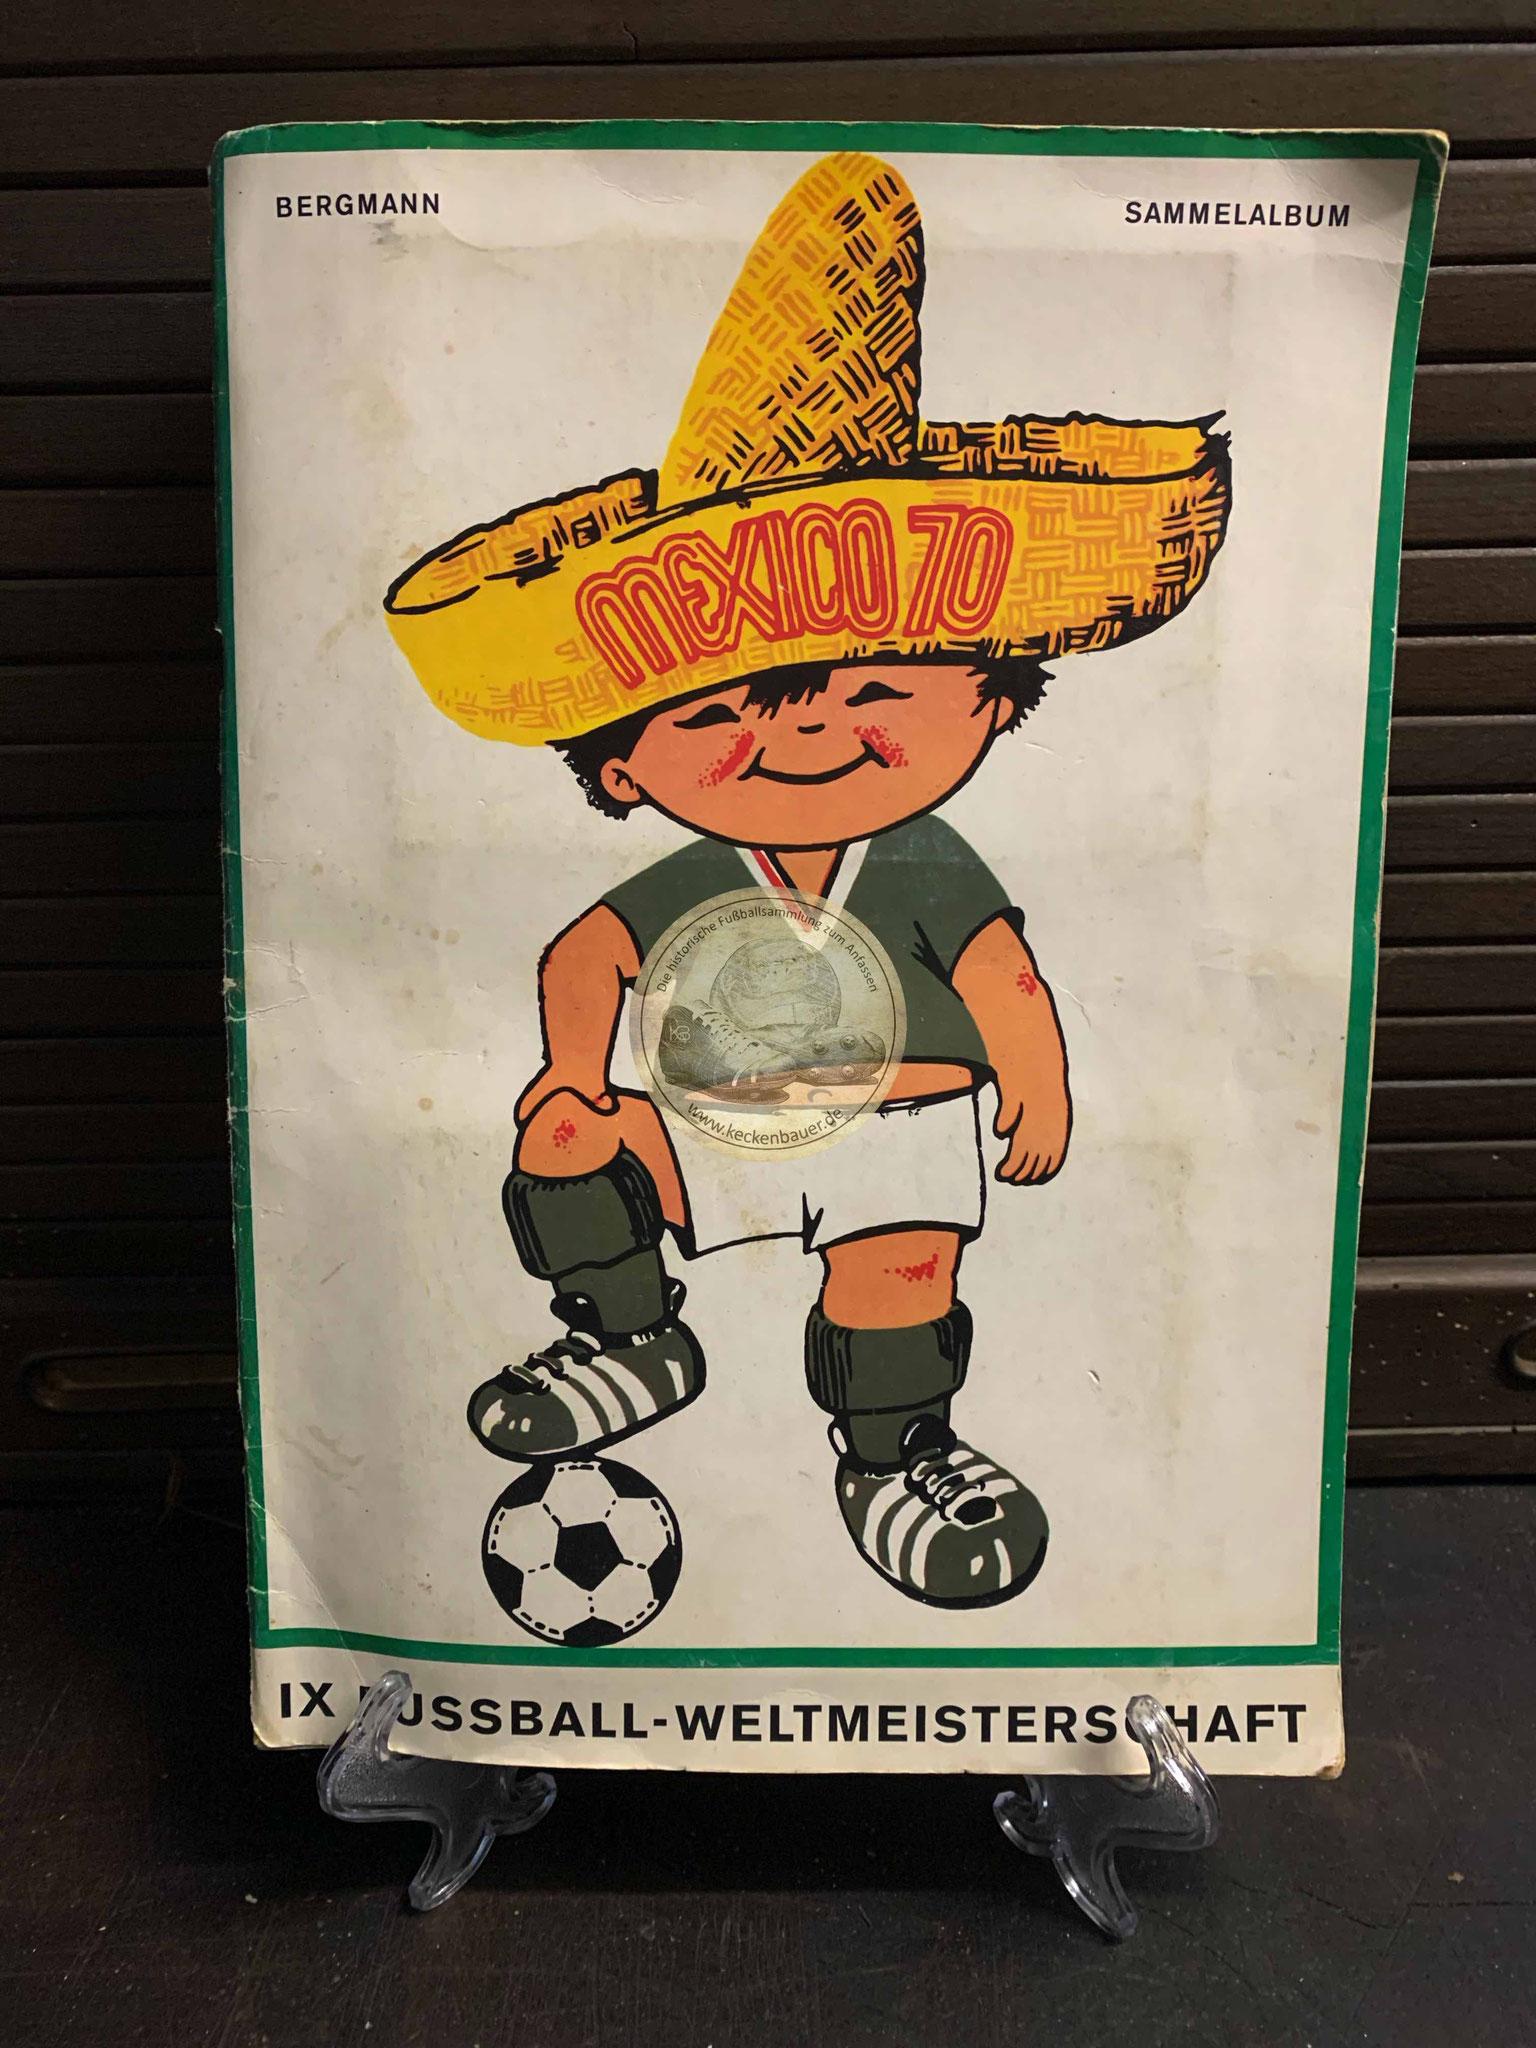 MEXICO 70. IX Fußball-Weltmeisterschaft. Ein Bergmann-Sammelalbum